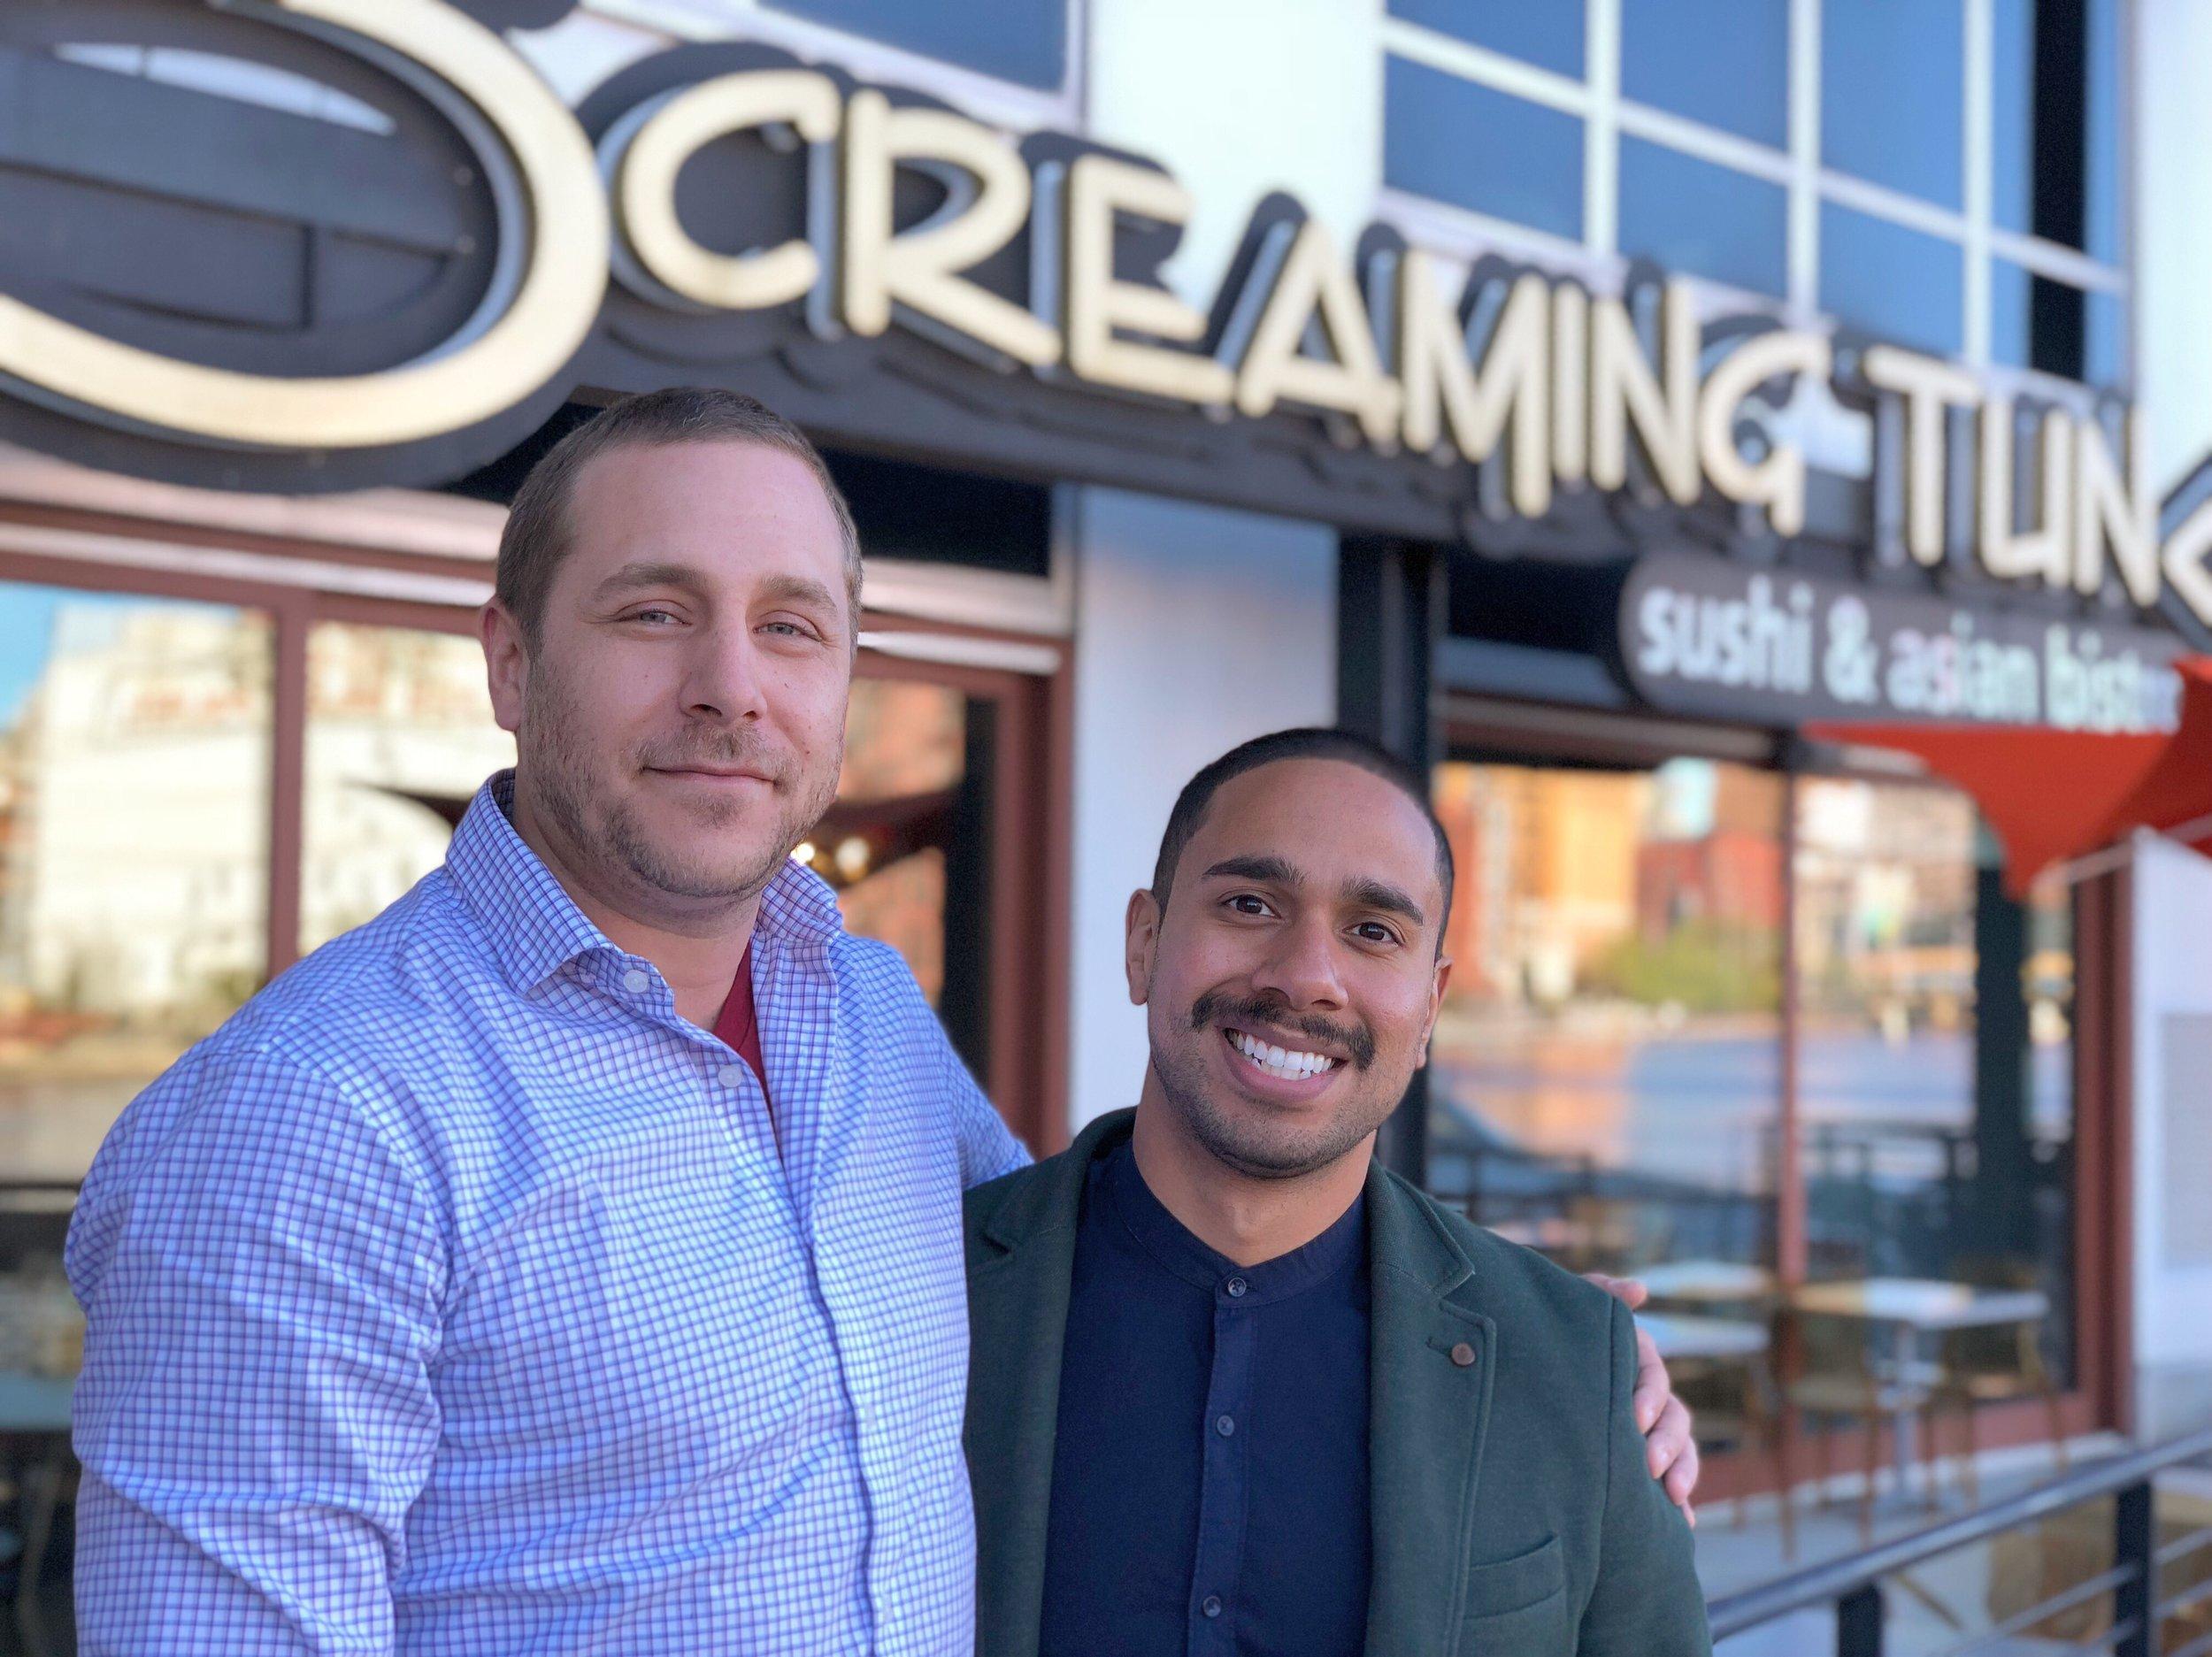 Jeff Bronstad and Cristian Vega, Owners of Screaming Tuna.jpeg